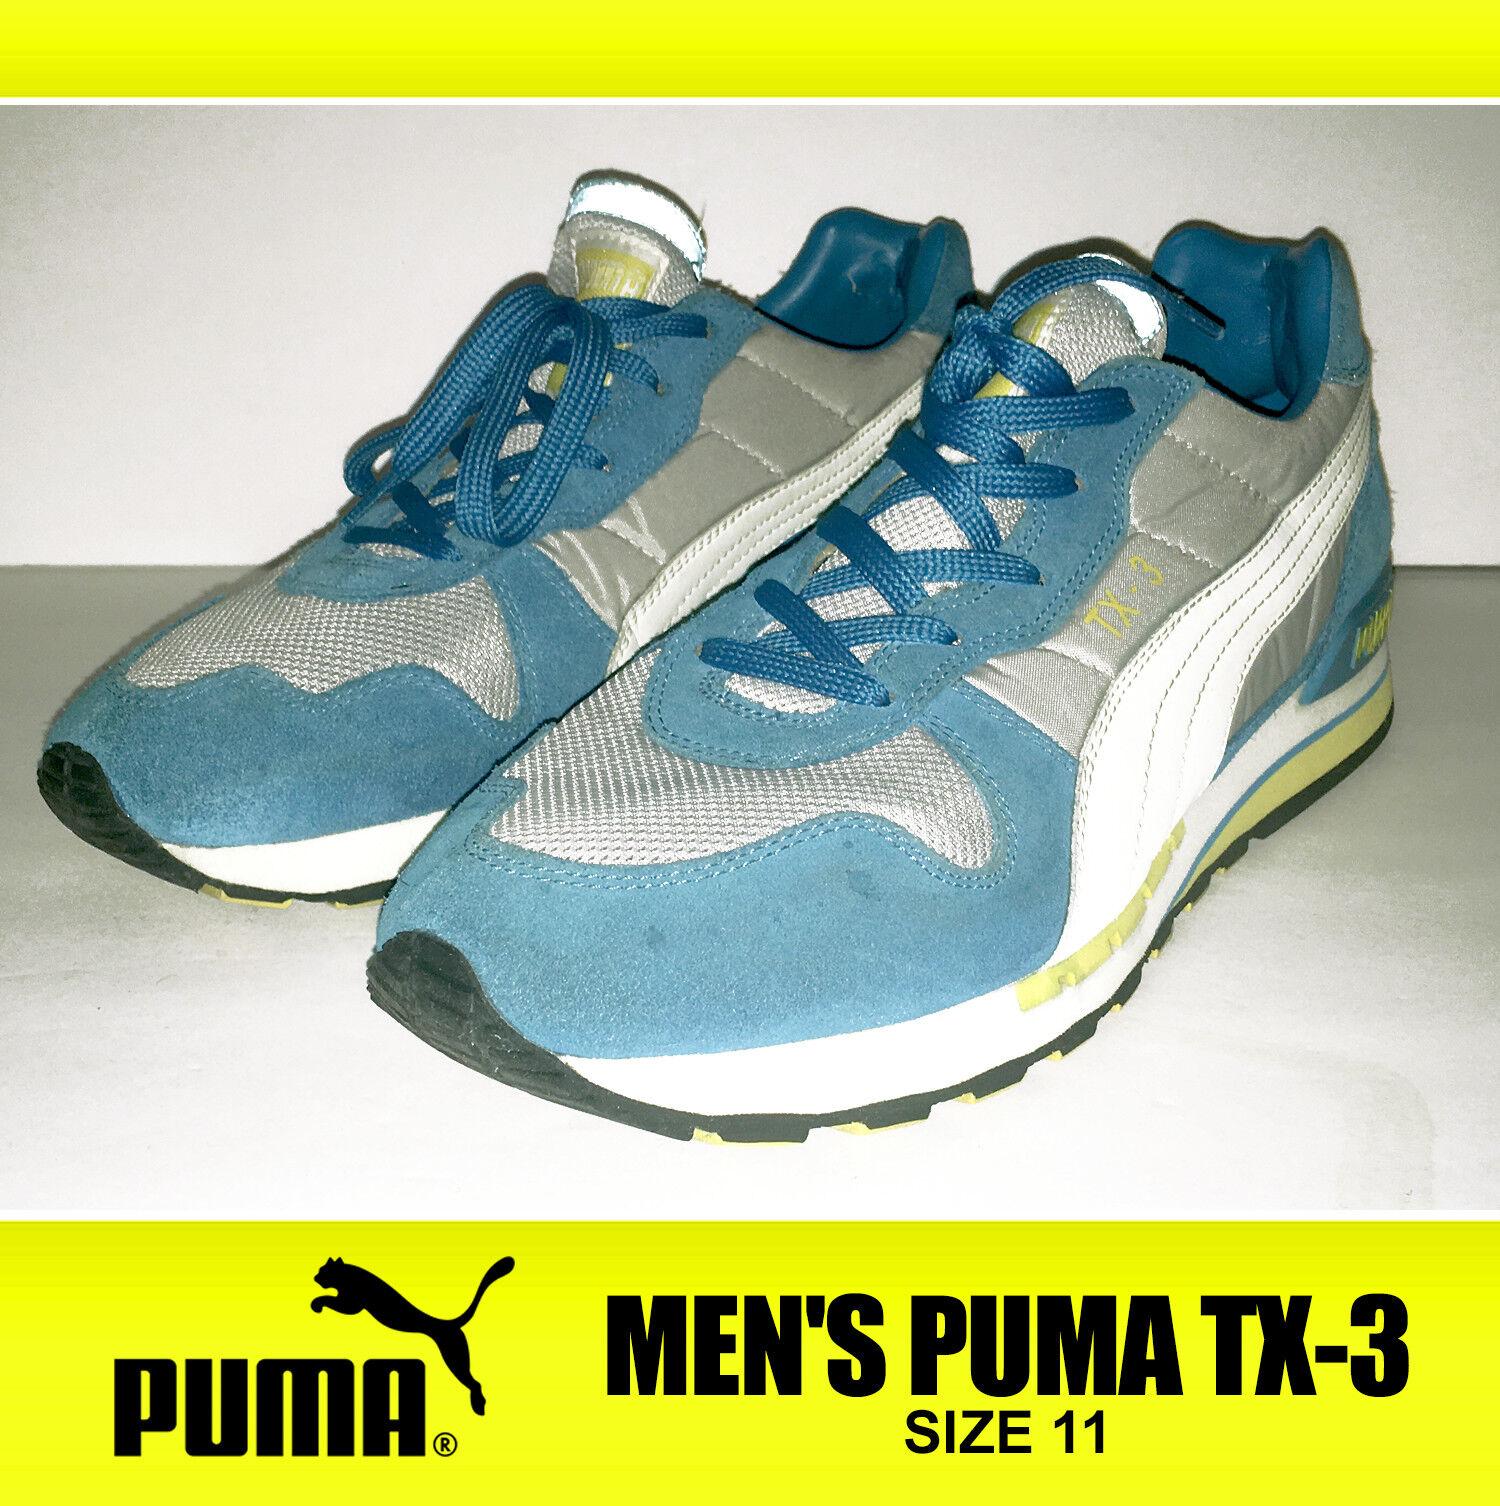 RARE! Men's Puma TX-3 Shoes Turquoise Blue Gray Runner Trainer Track Sprint Sunn